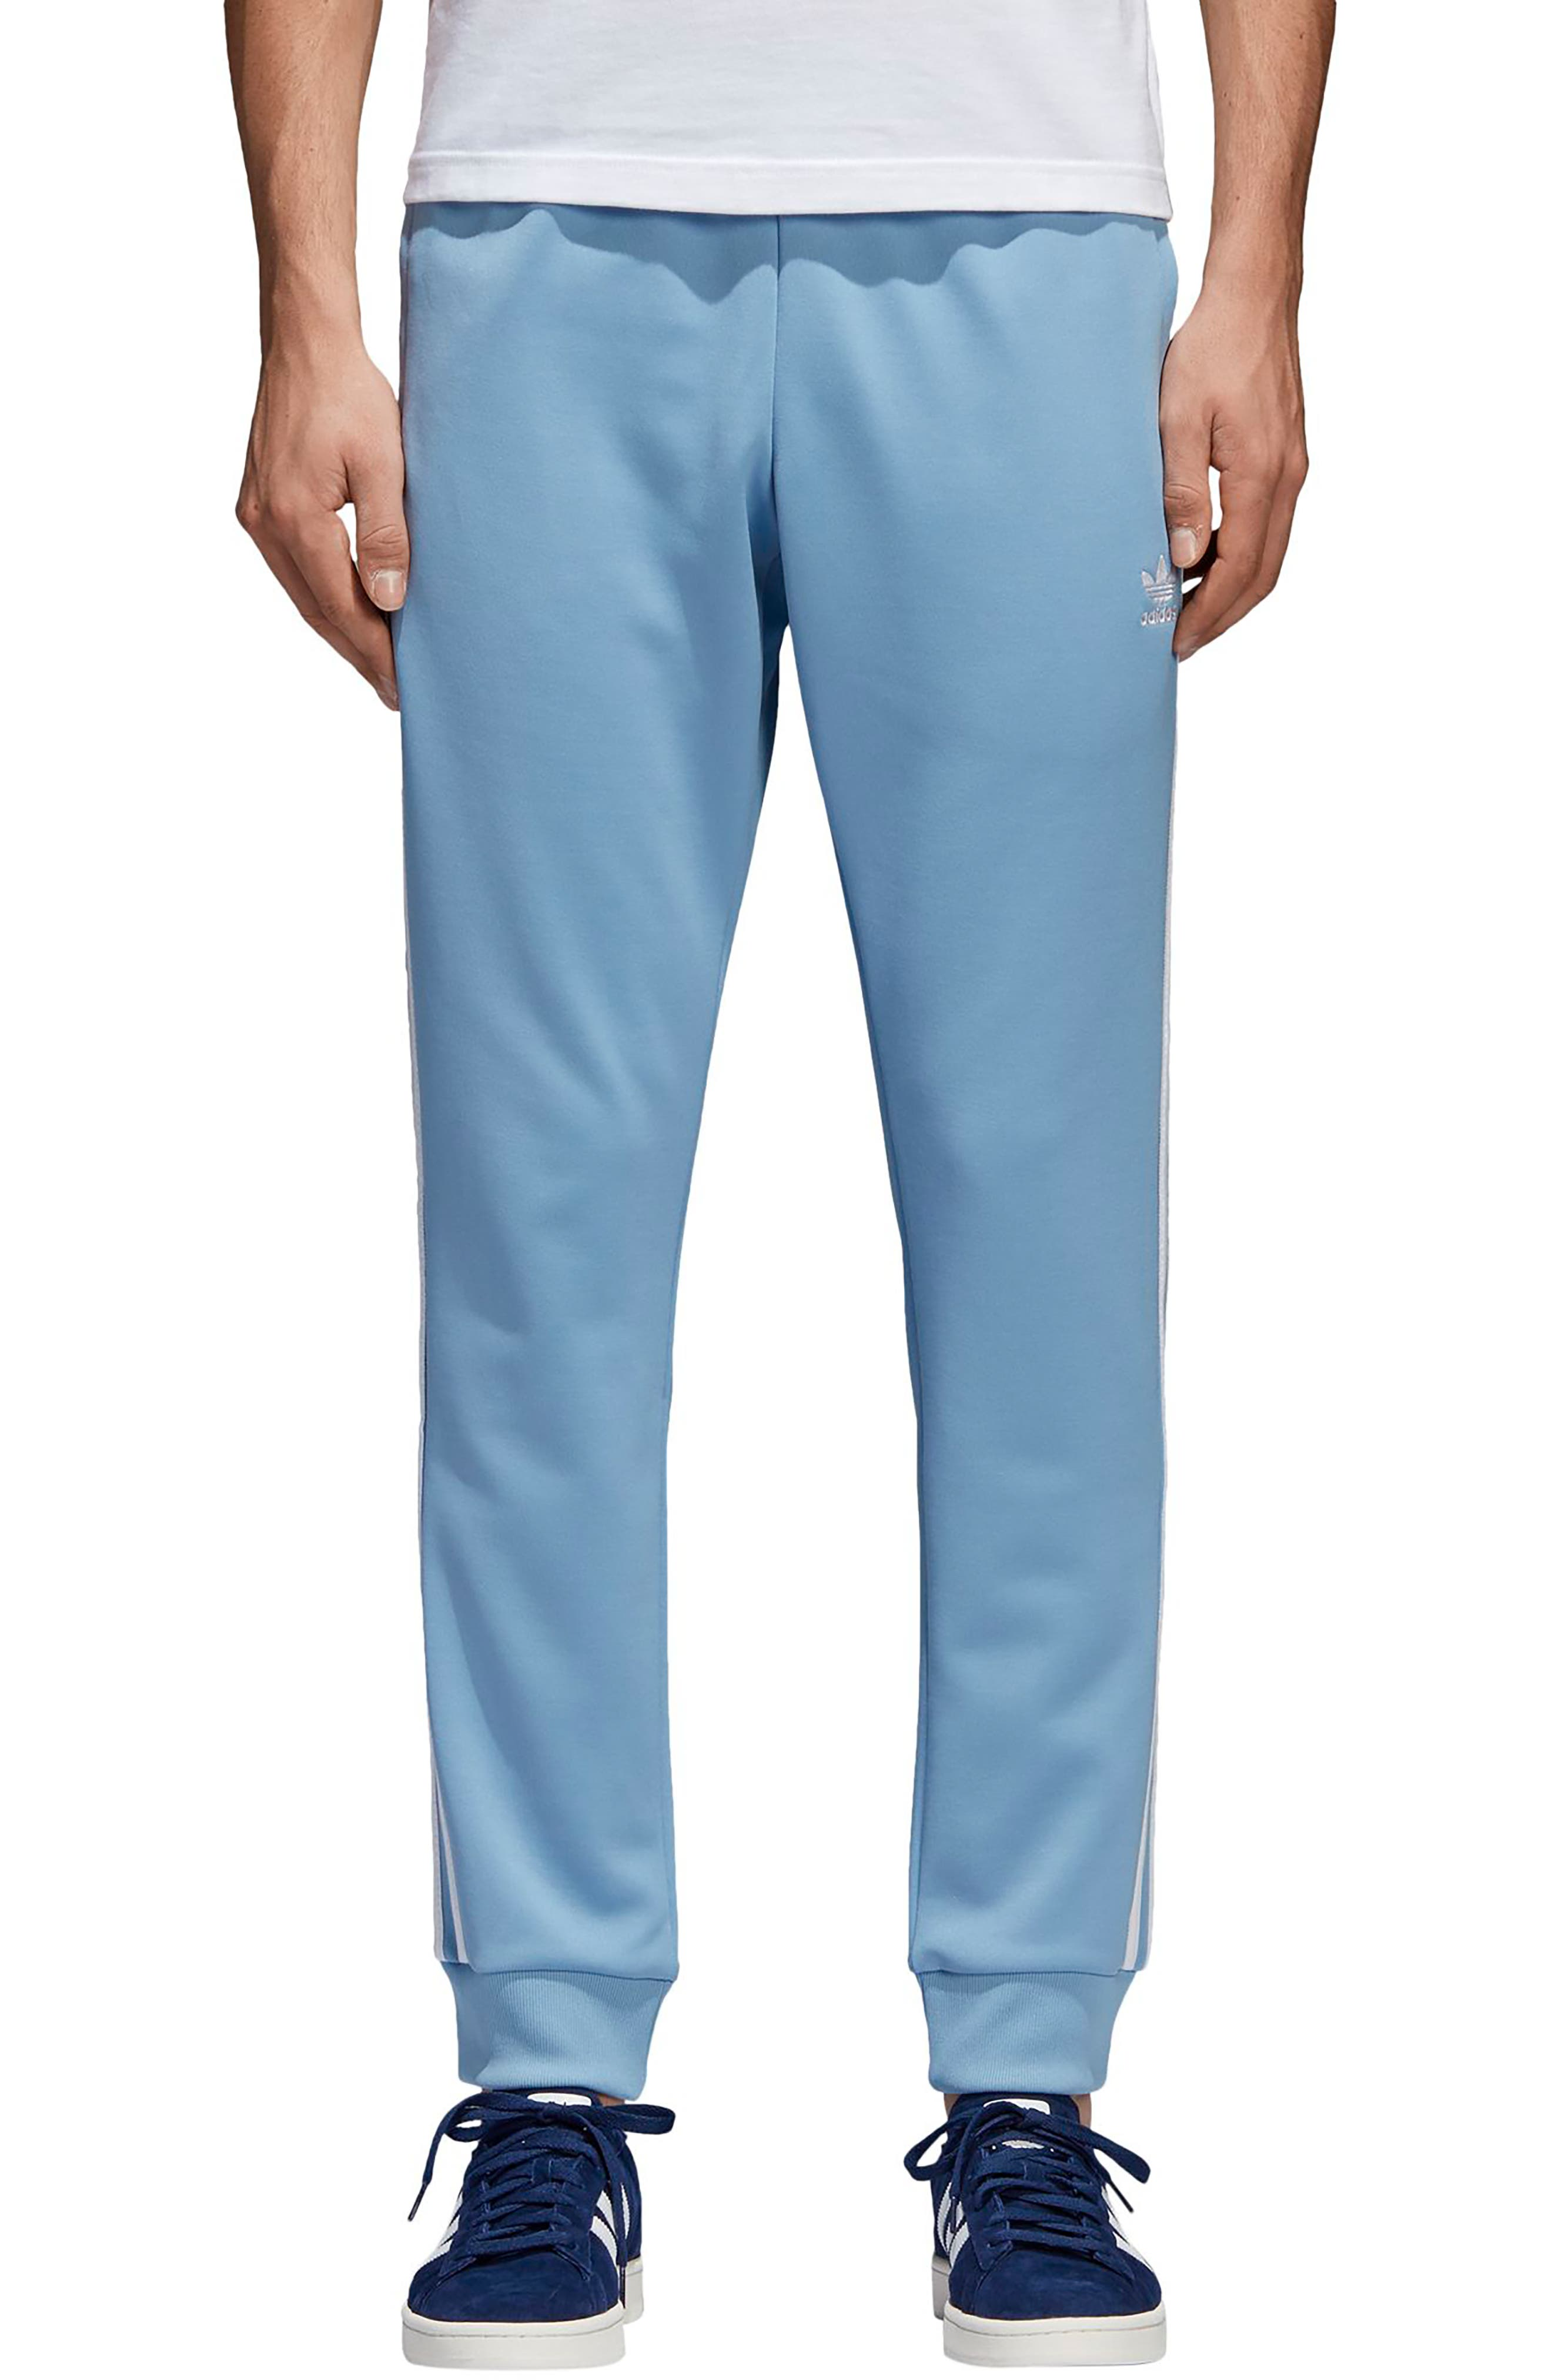 SST Track Pants,                         Main,                         color, 459